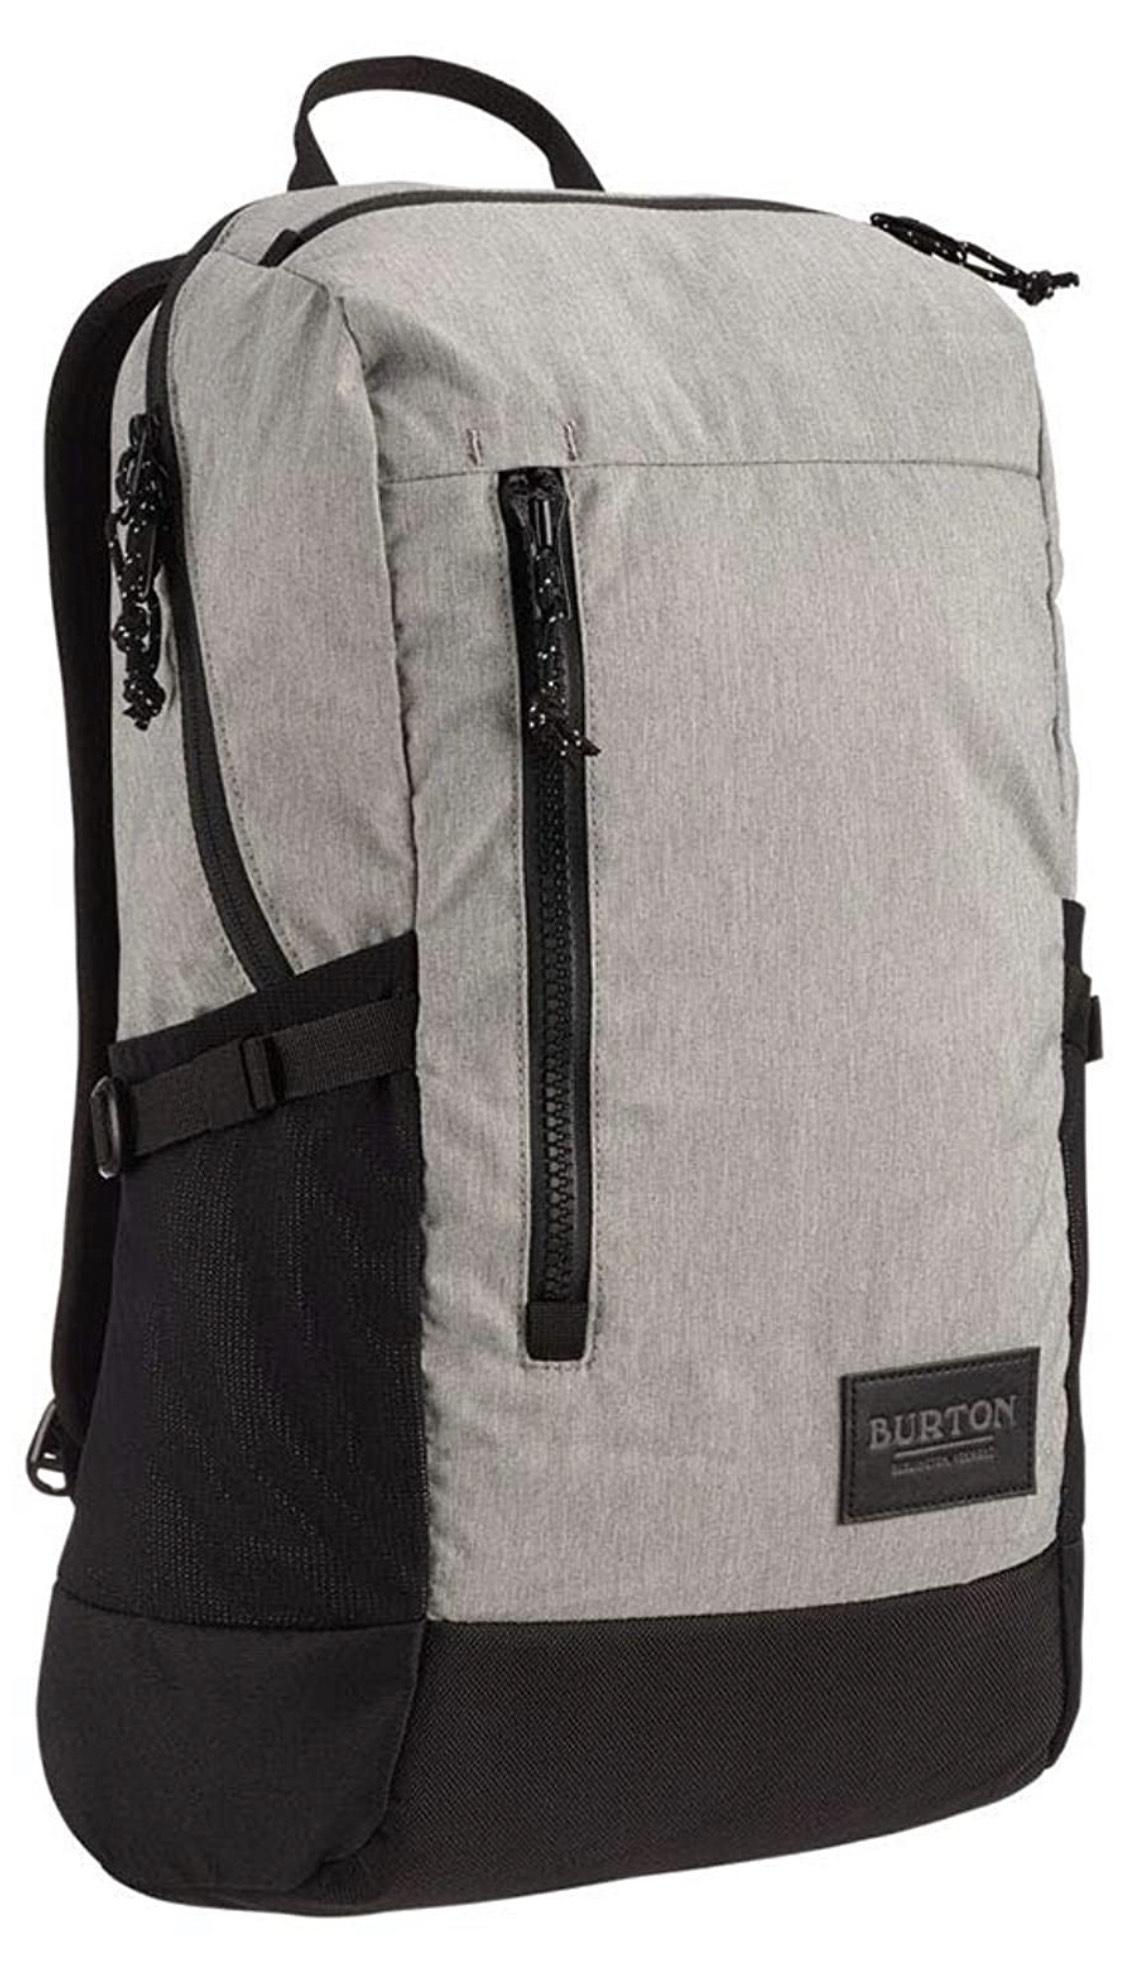 [Prime] Burton Prospect 2.0 Daypack Rucksack 20L grau (+weitere Farben)